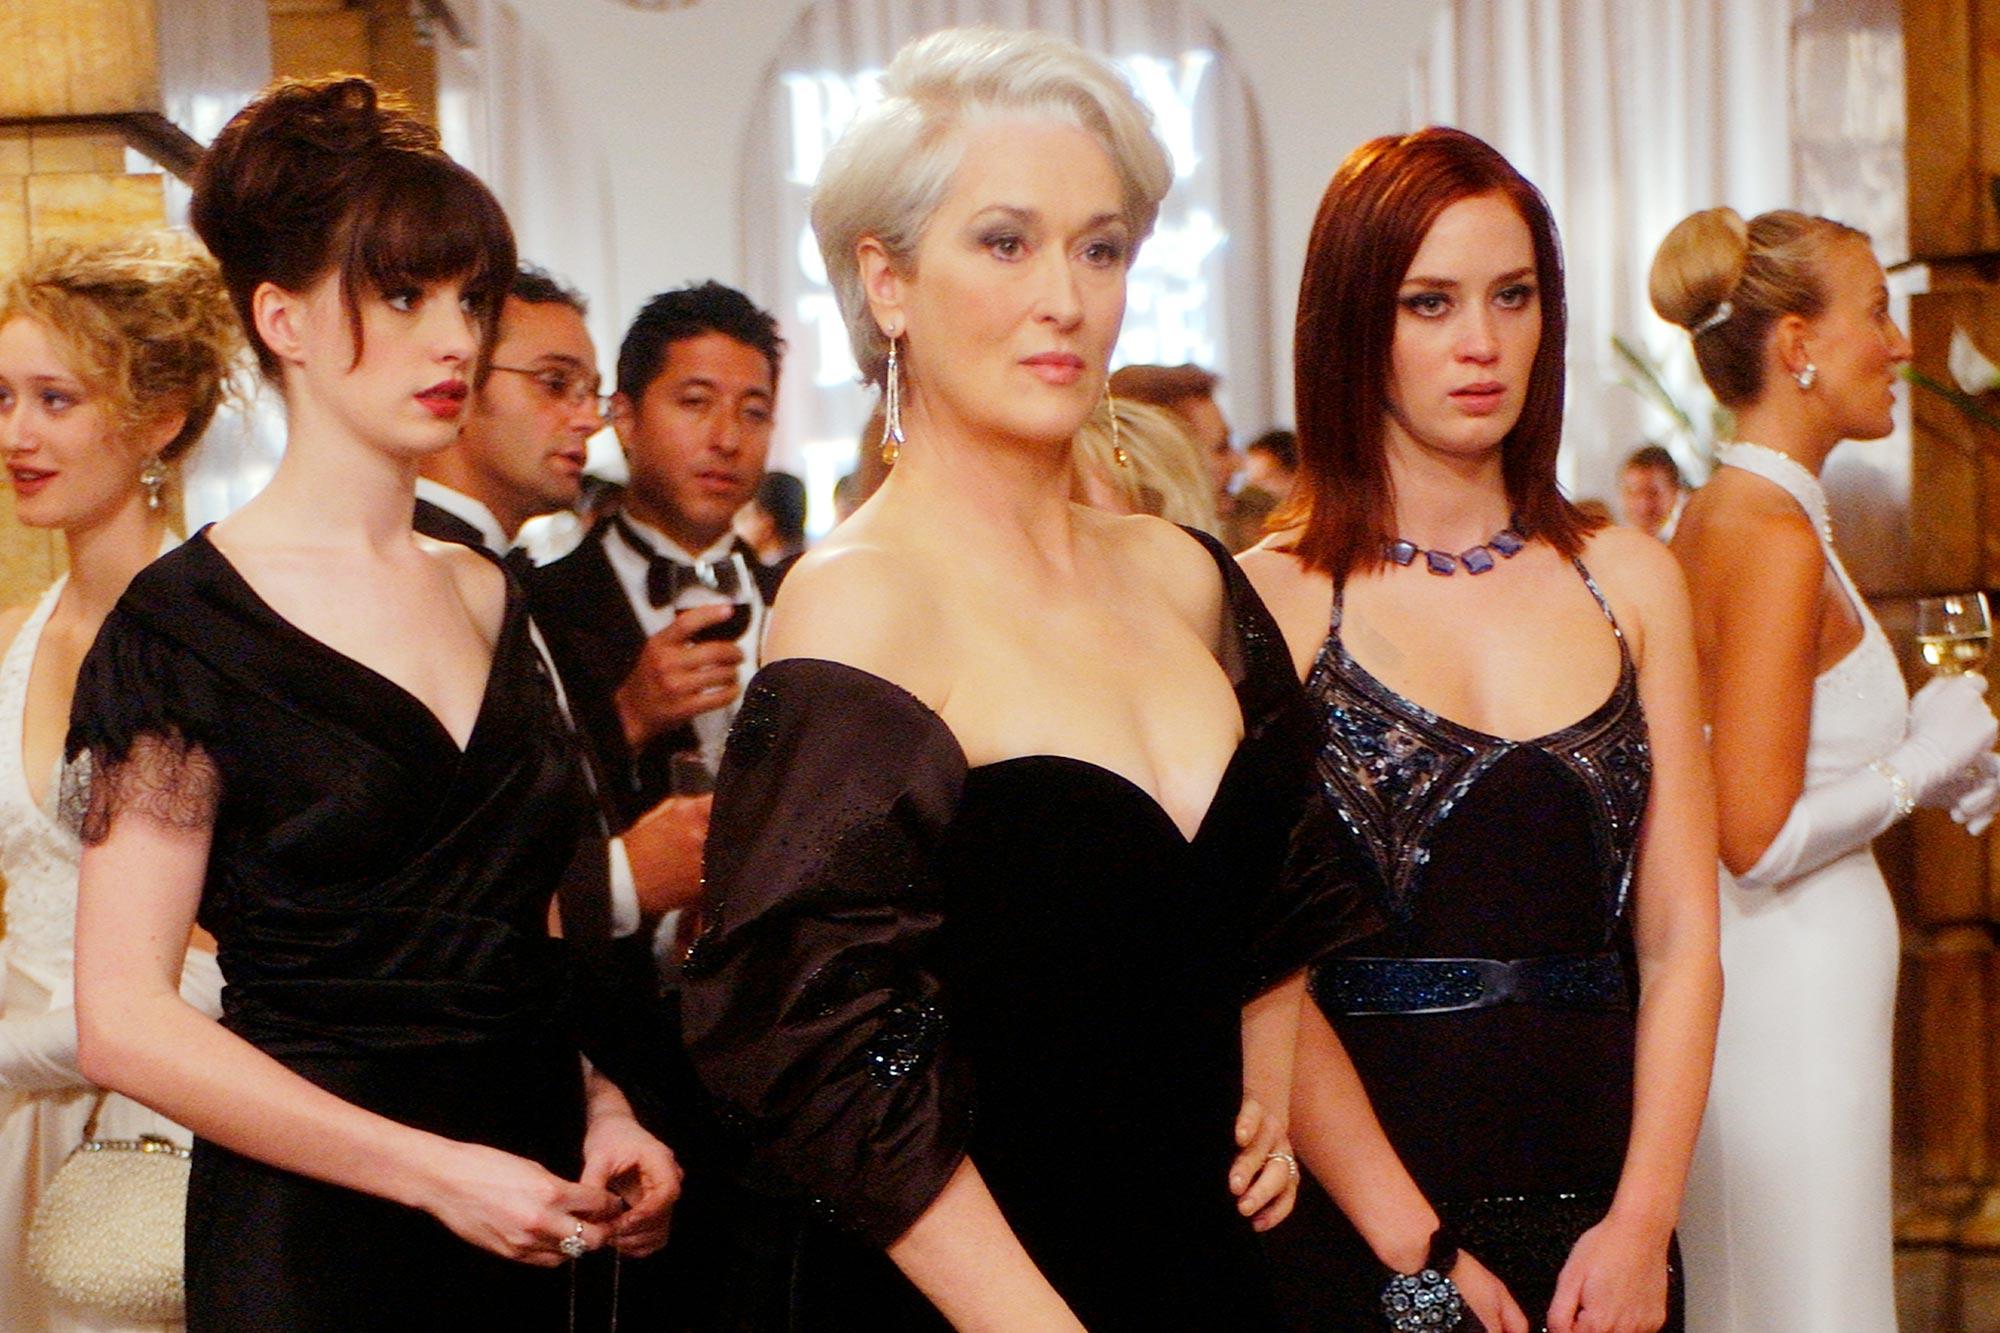 Anne Hathaway, Meryl Streep, and Emily Blunt in 'The Devil Wears Prada.'